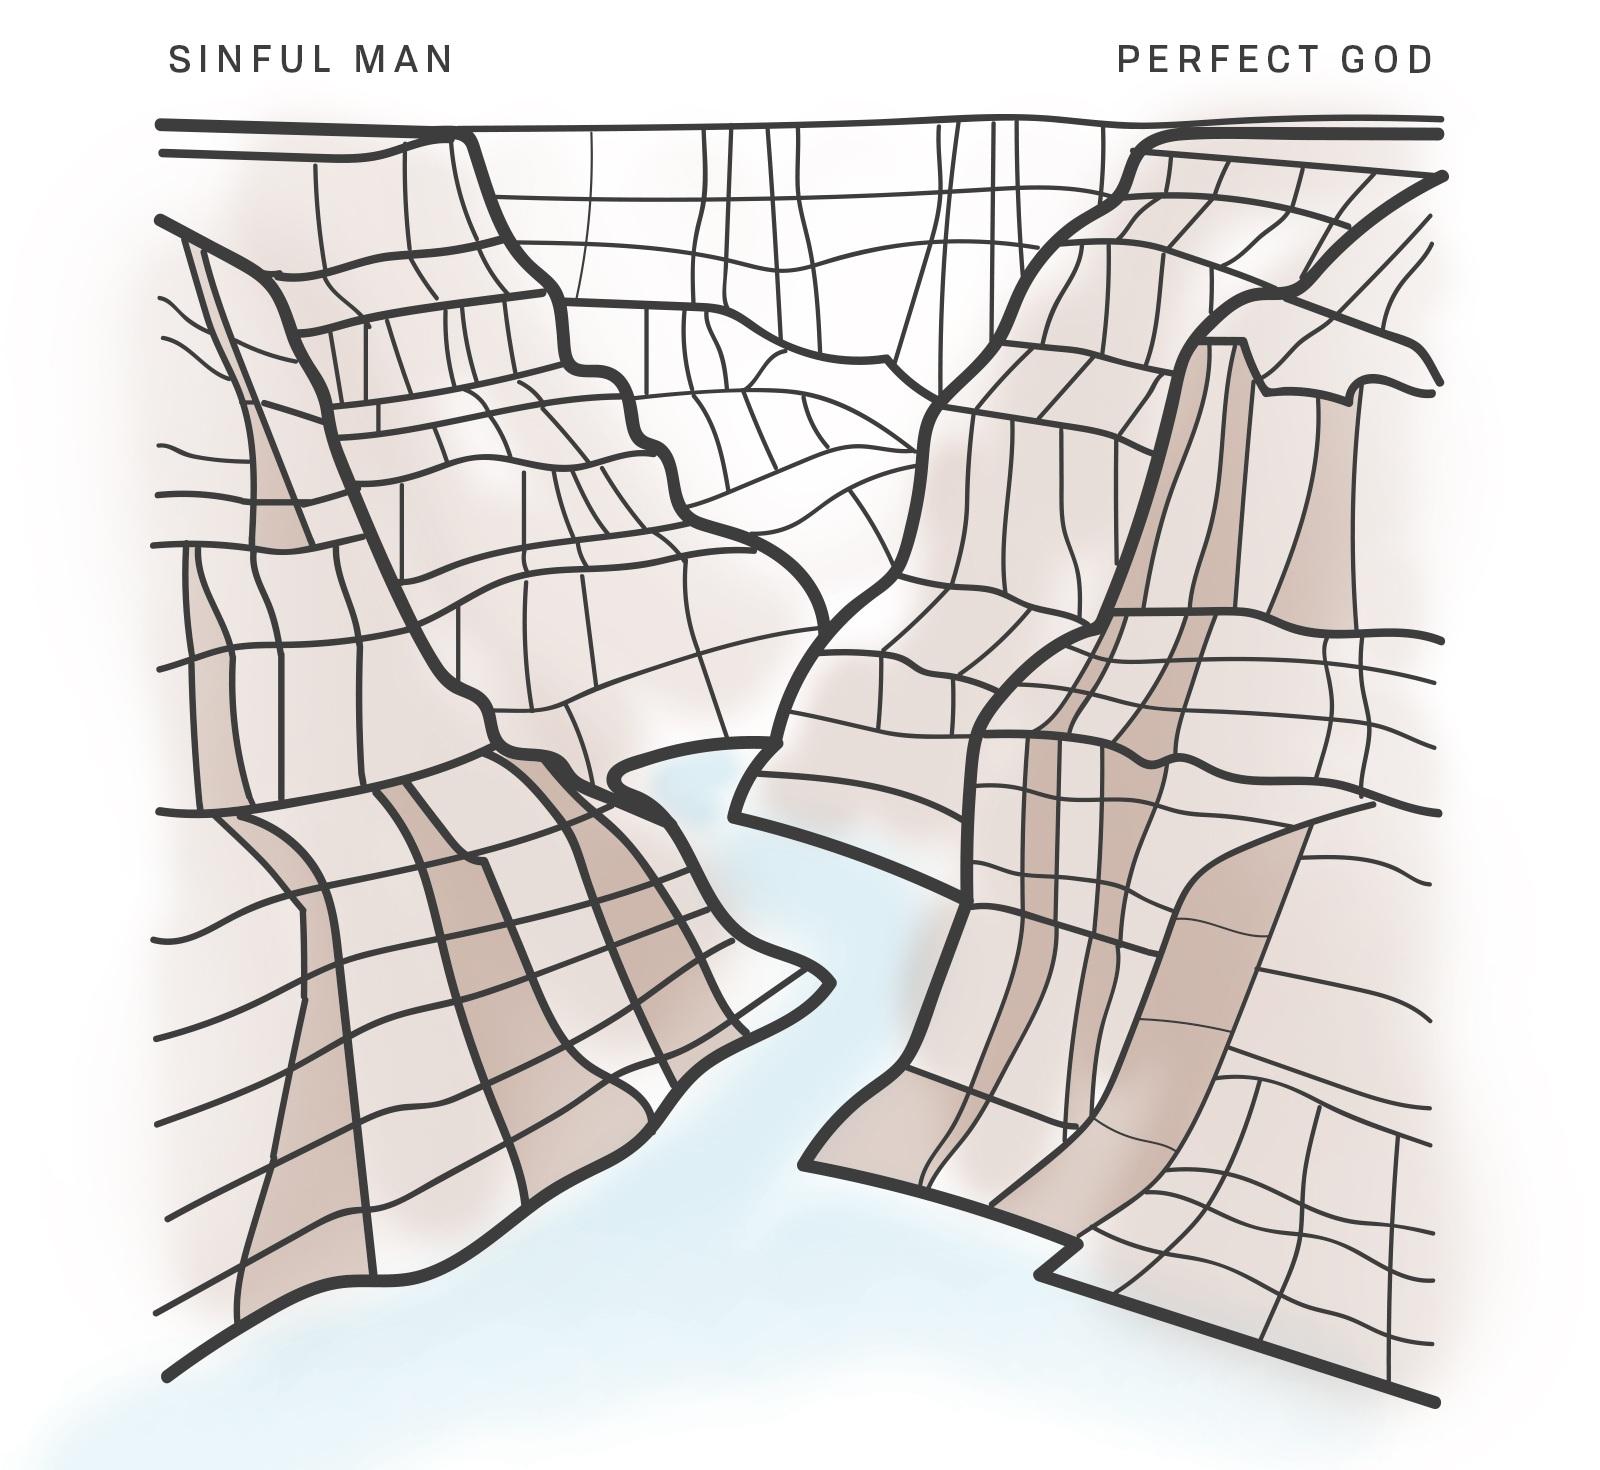 Gospel+Story_Chasm+Graphic.jpg